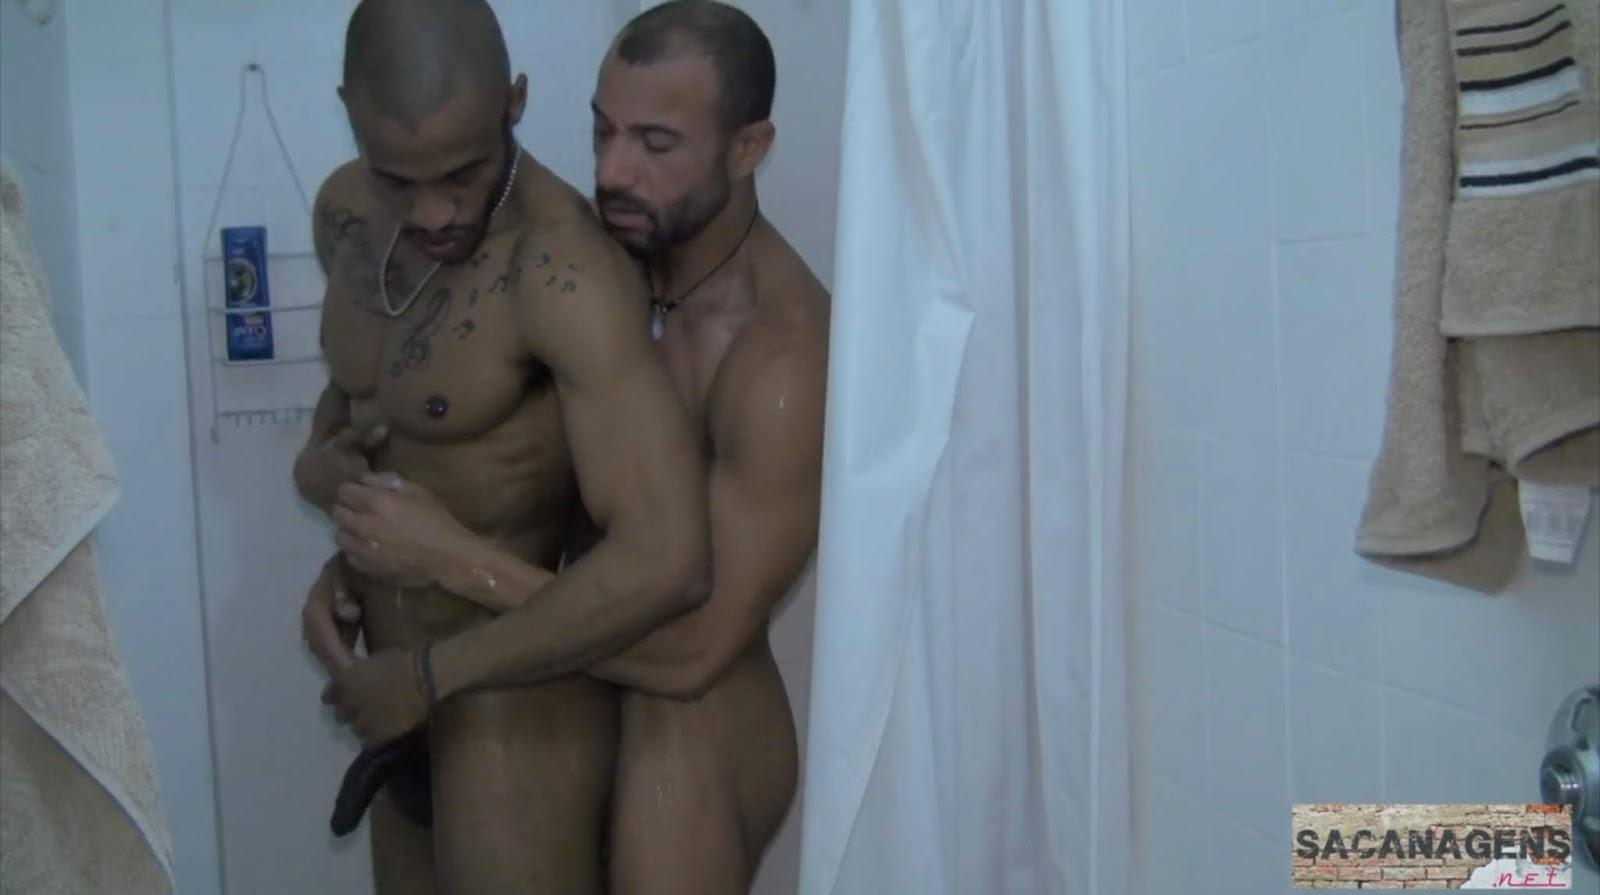 Duchas E Making Of Sacanagens Gays Musculo Duro Videos De Sexo